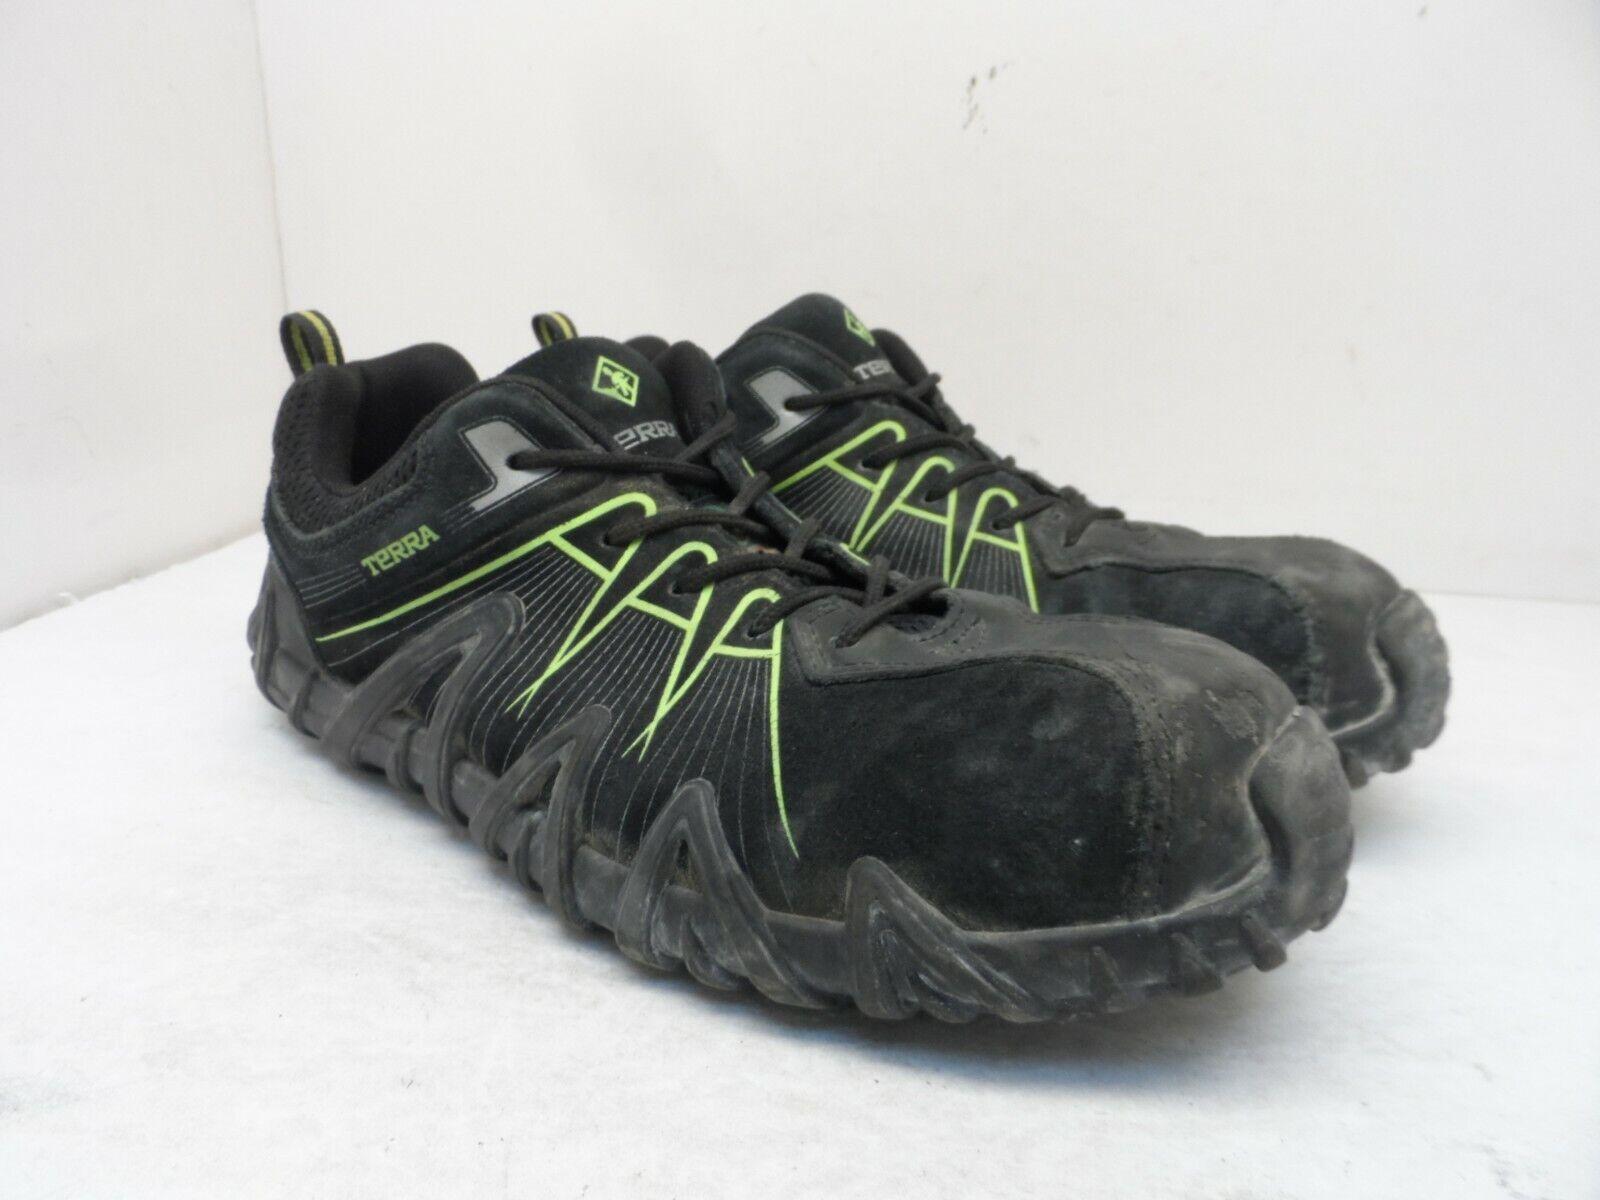 Terra Men's Spider 3.0 Composite Toe Work Shoe Black/Green Size 10.5M